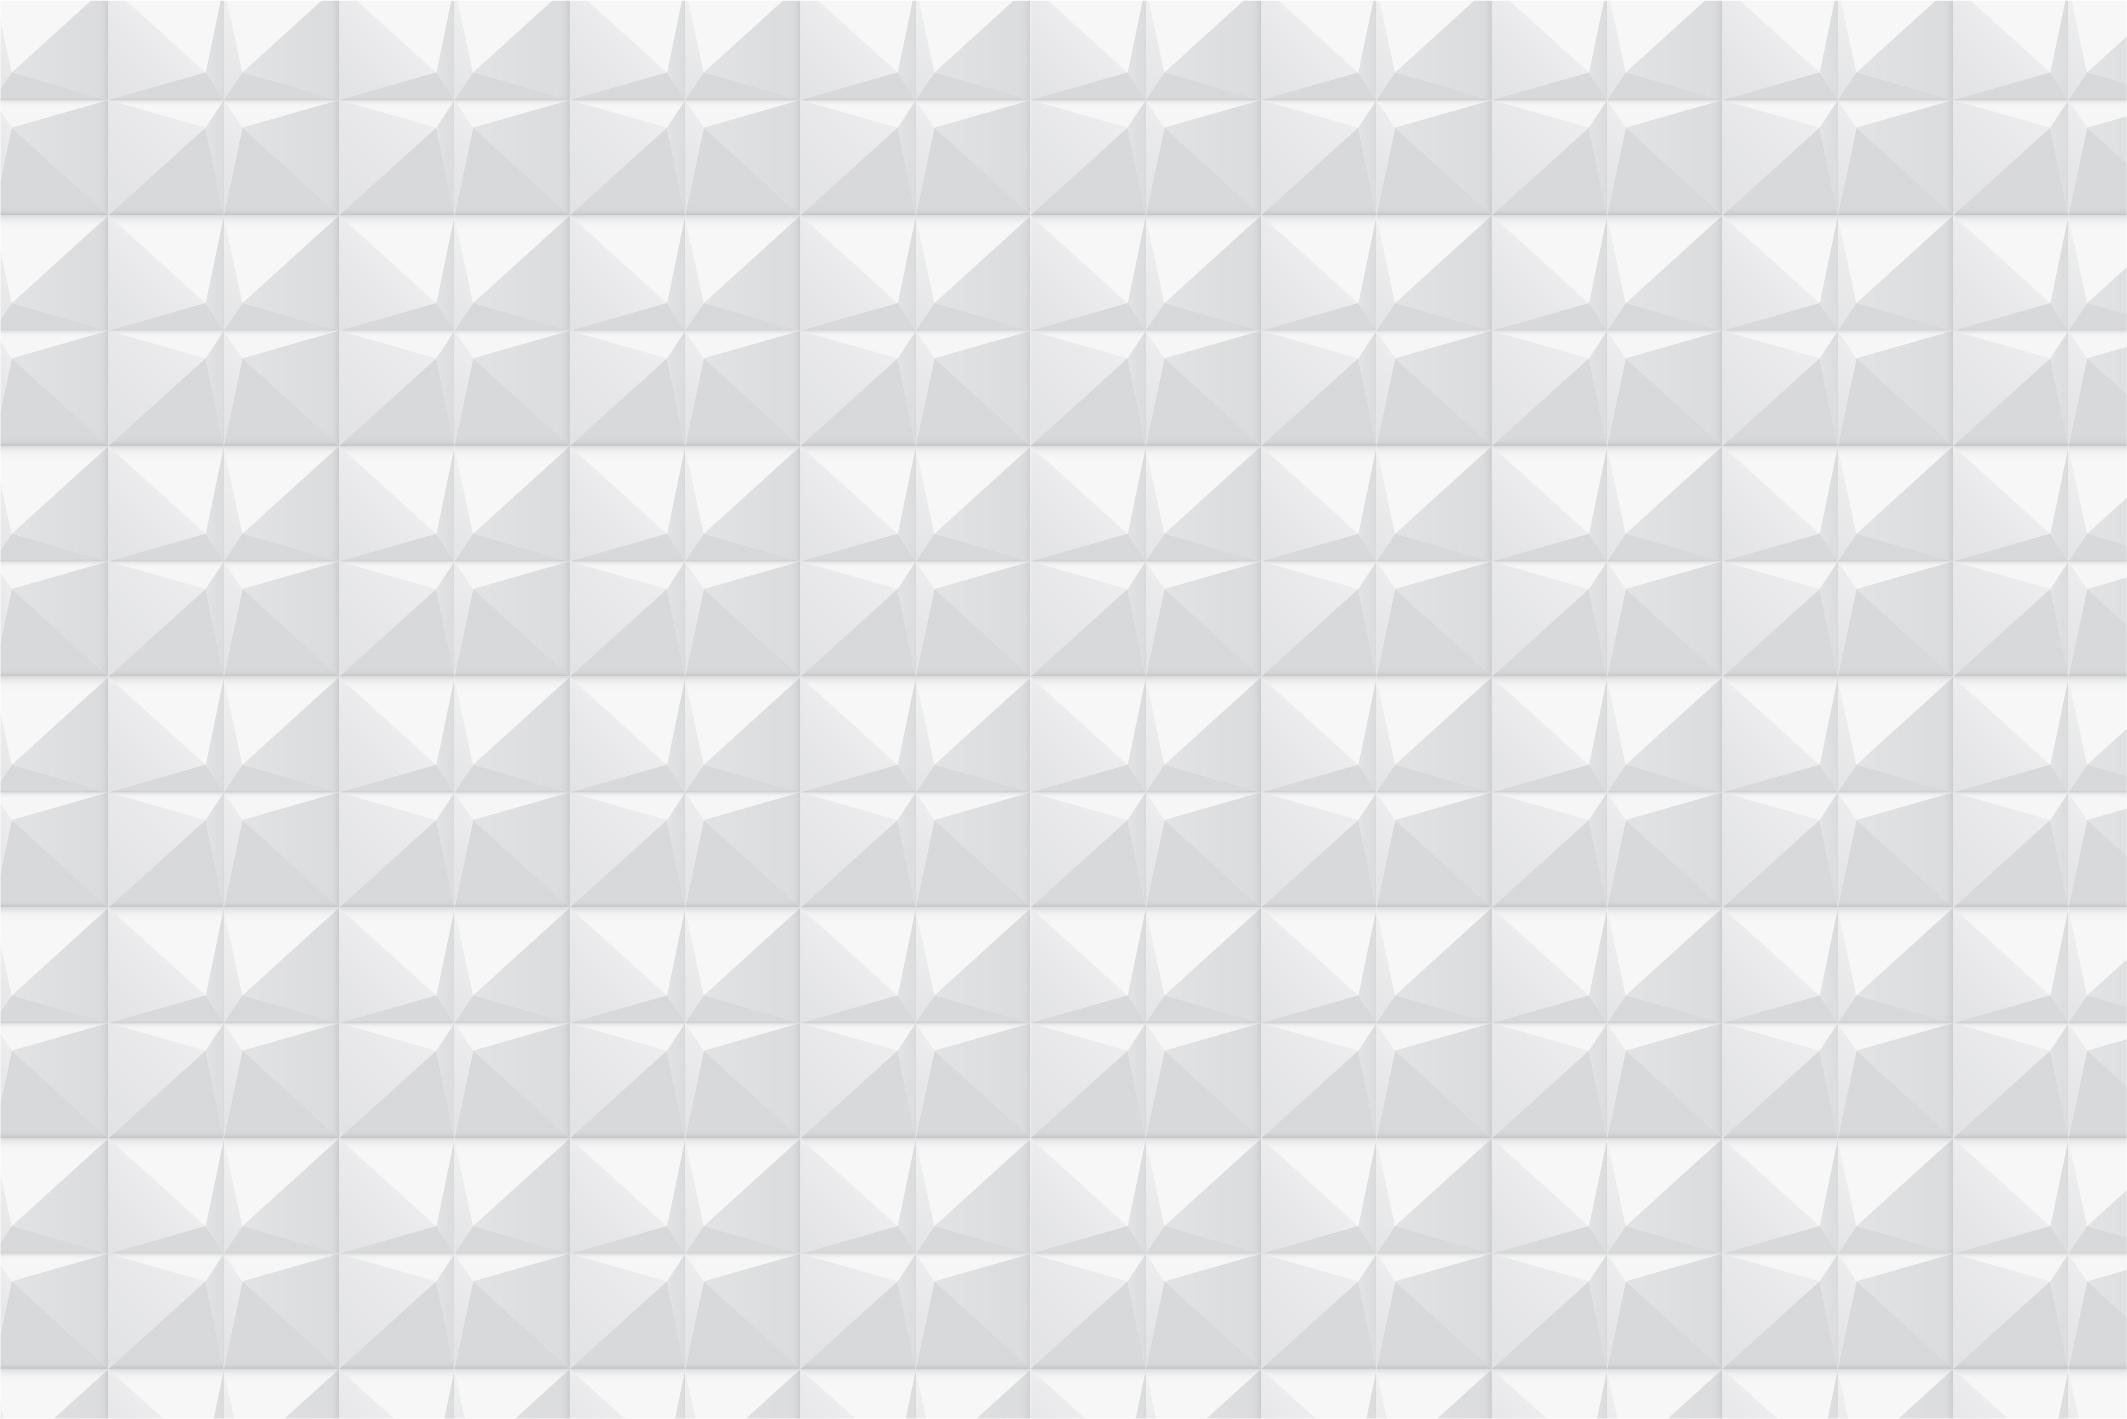 White geometric 3d seamless textures example image 12